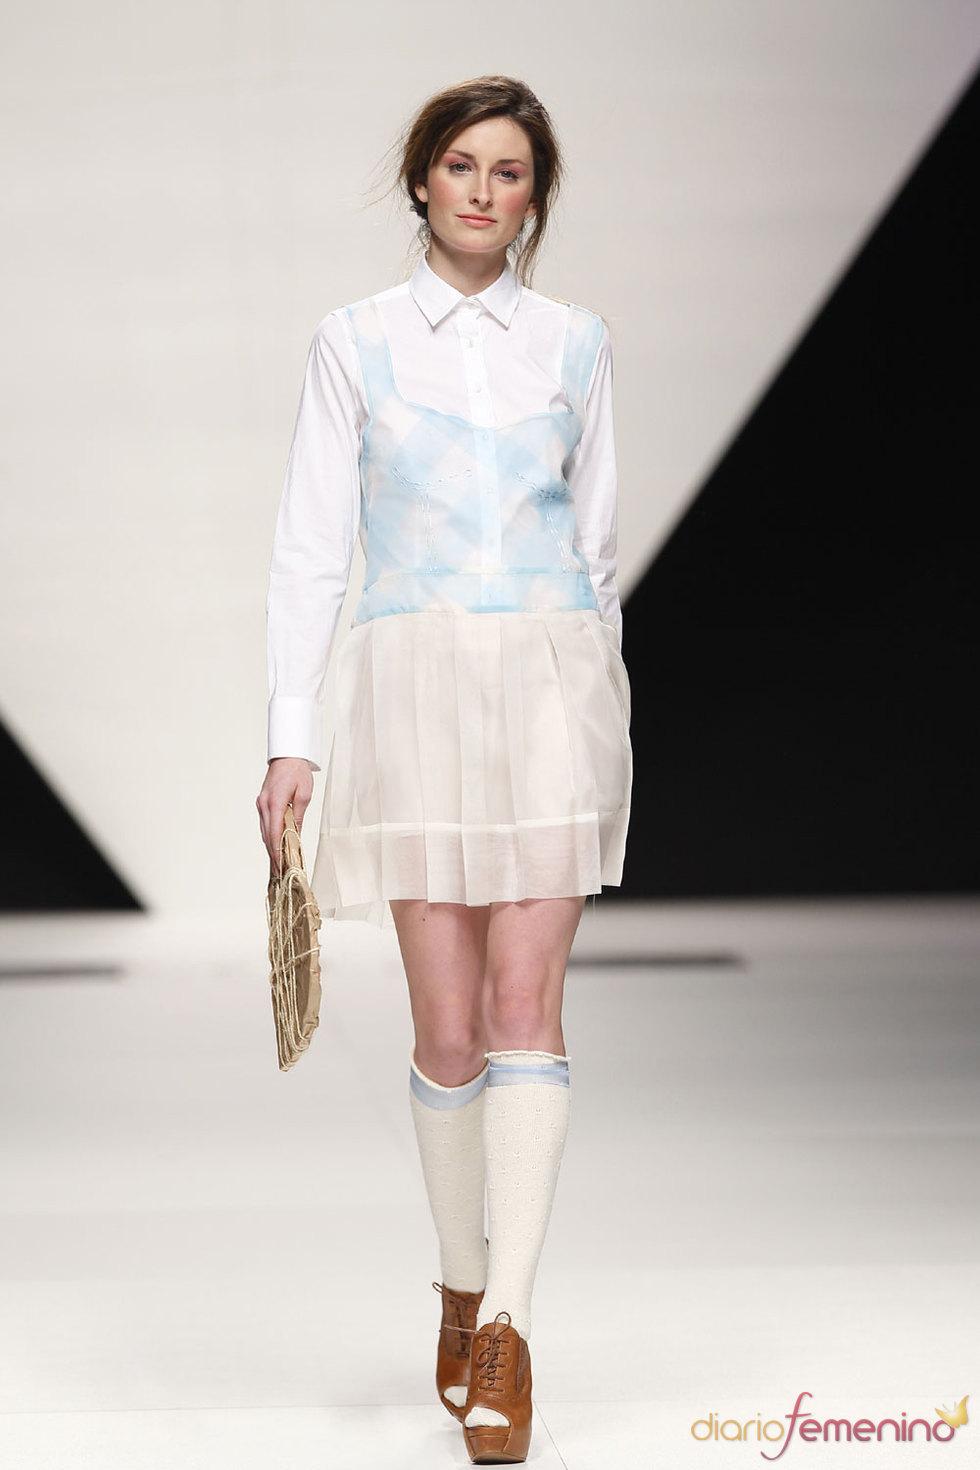 Moda joven 2010 - American Perez -  Cibeles  Fashion Week